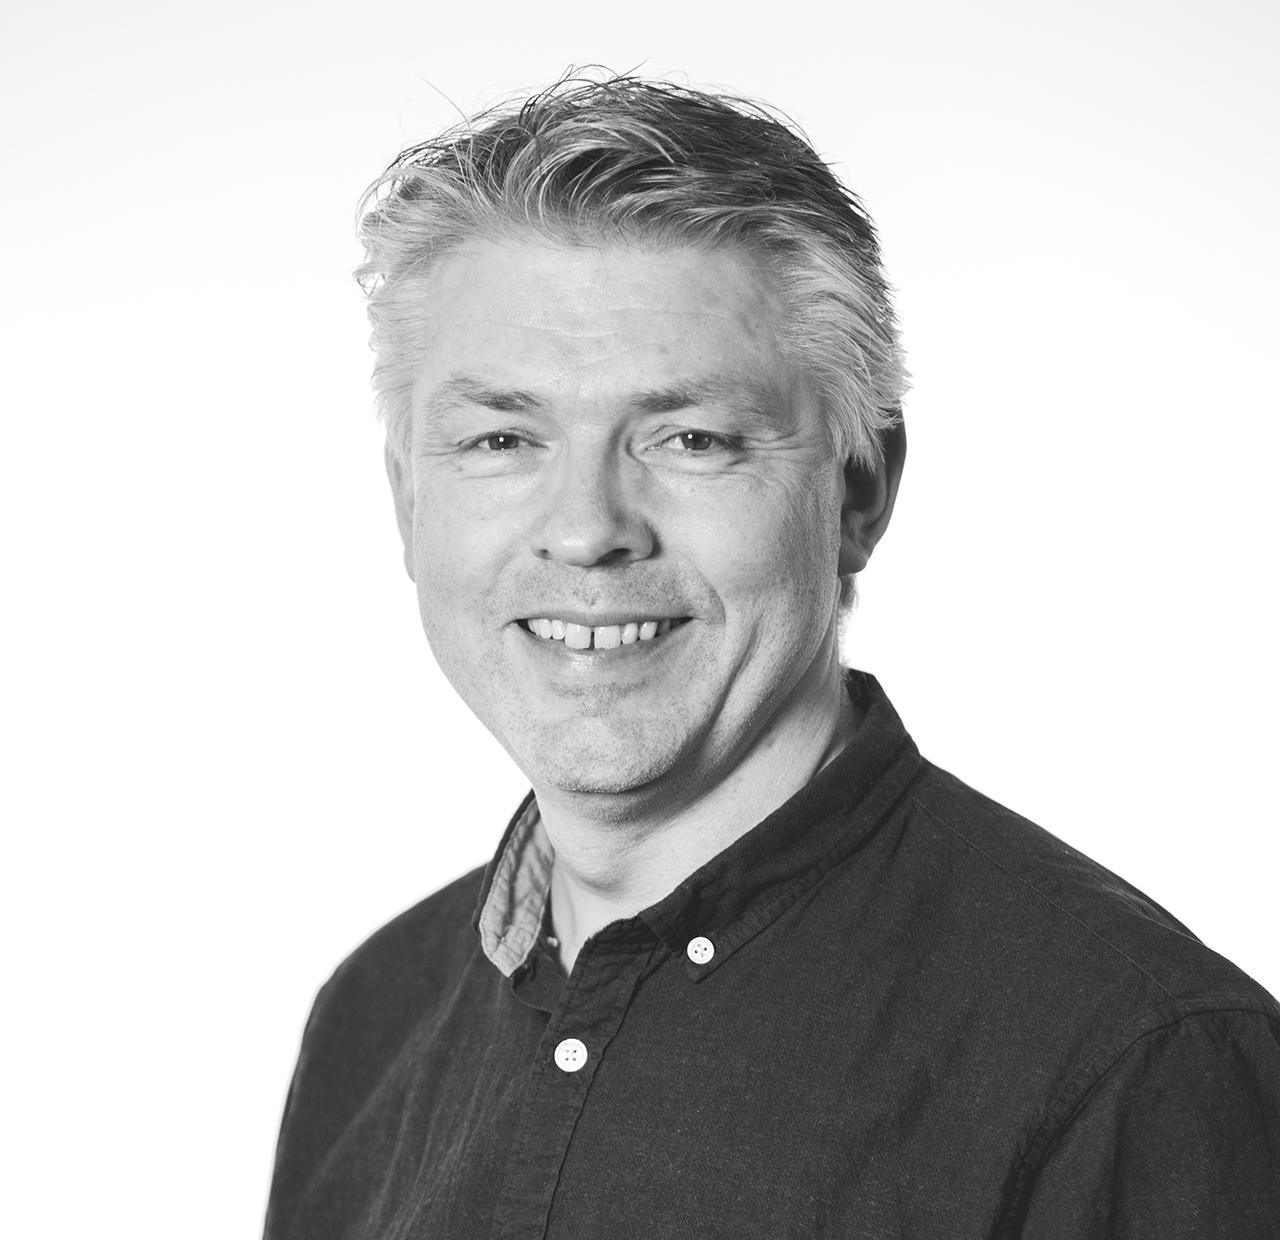 Marius Råkil